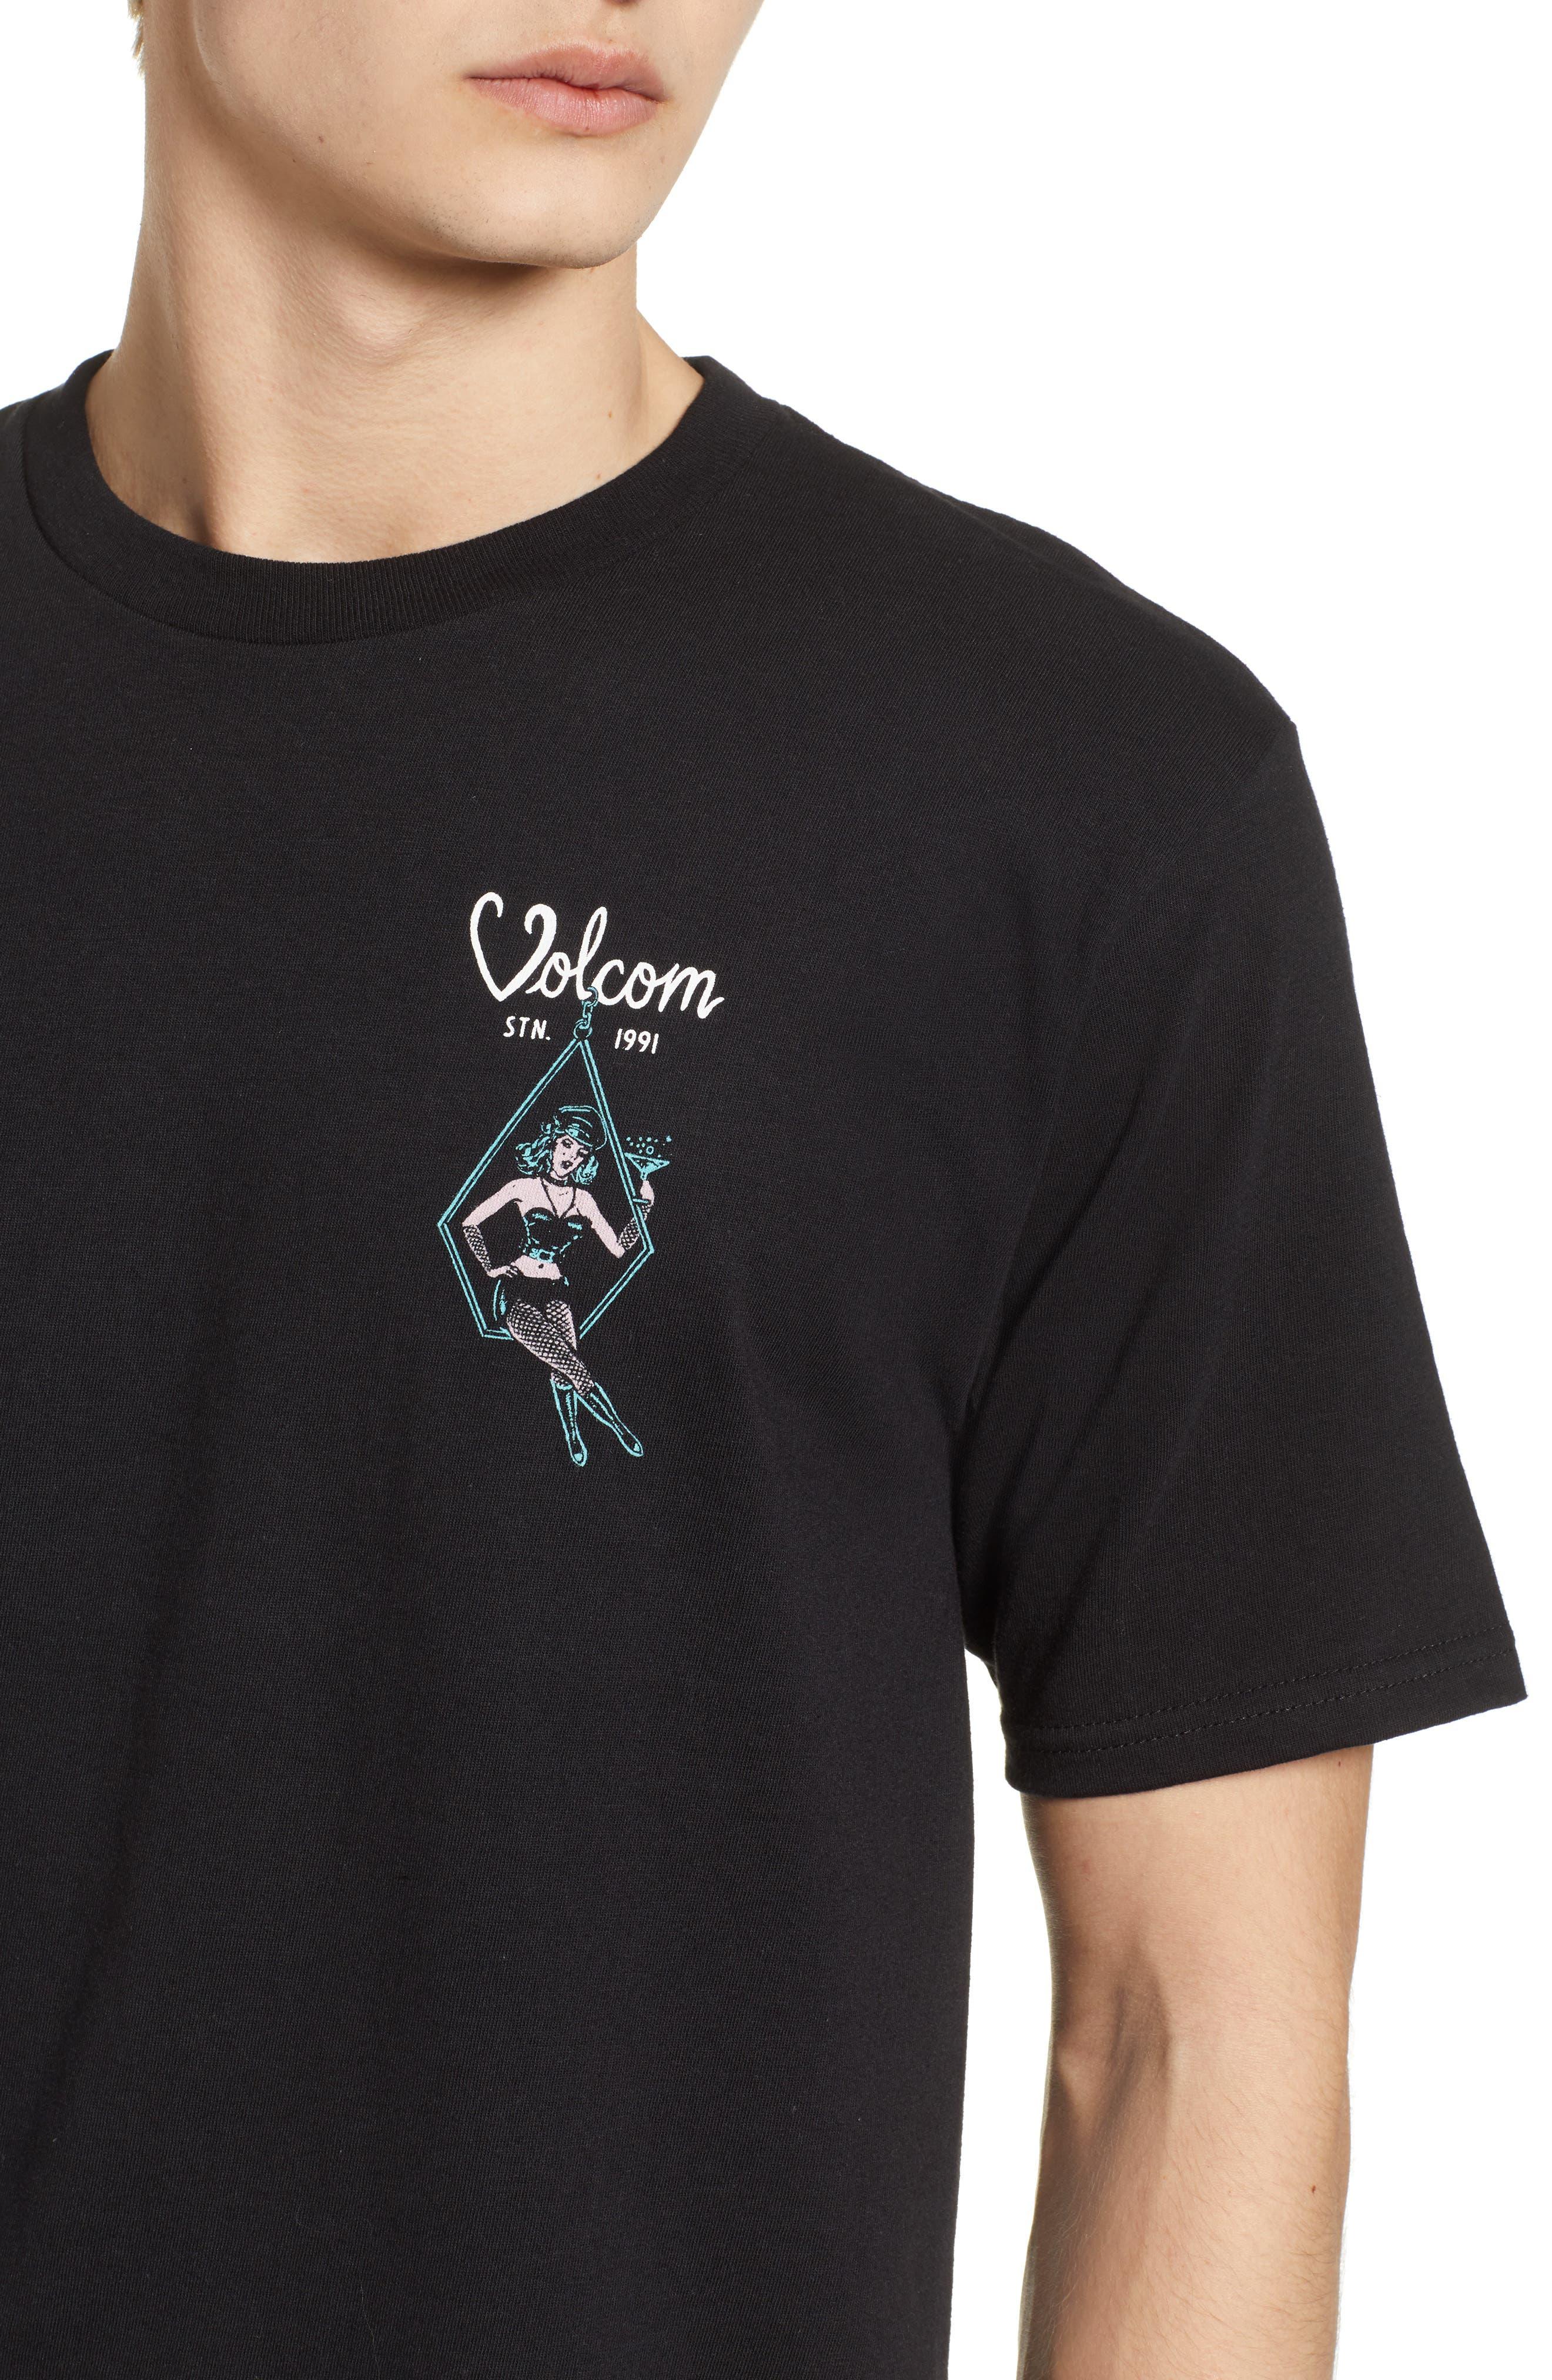 Swingers Saloon T-Shirt,                             Alternate thumbnail 4, color,                             Black